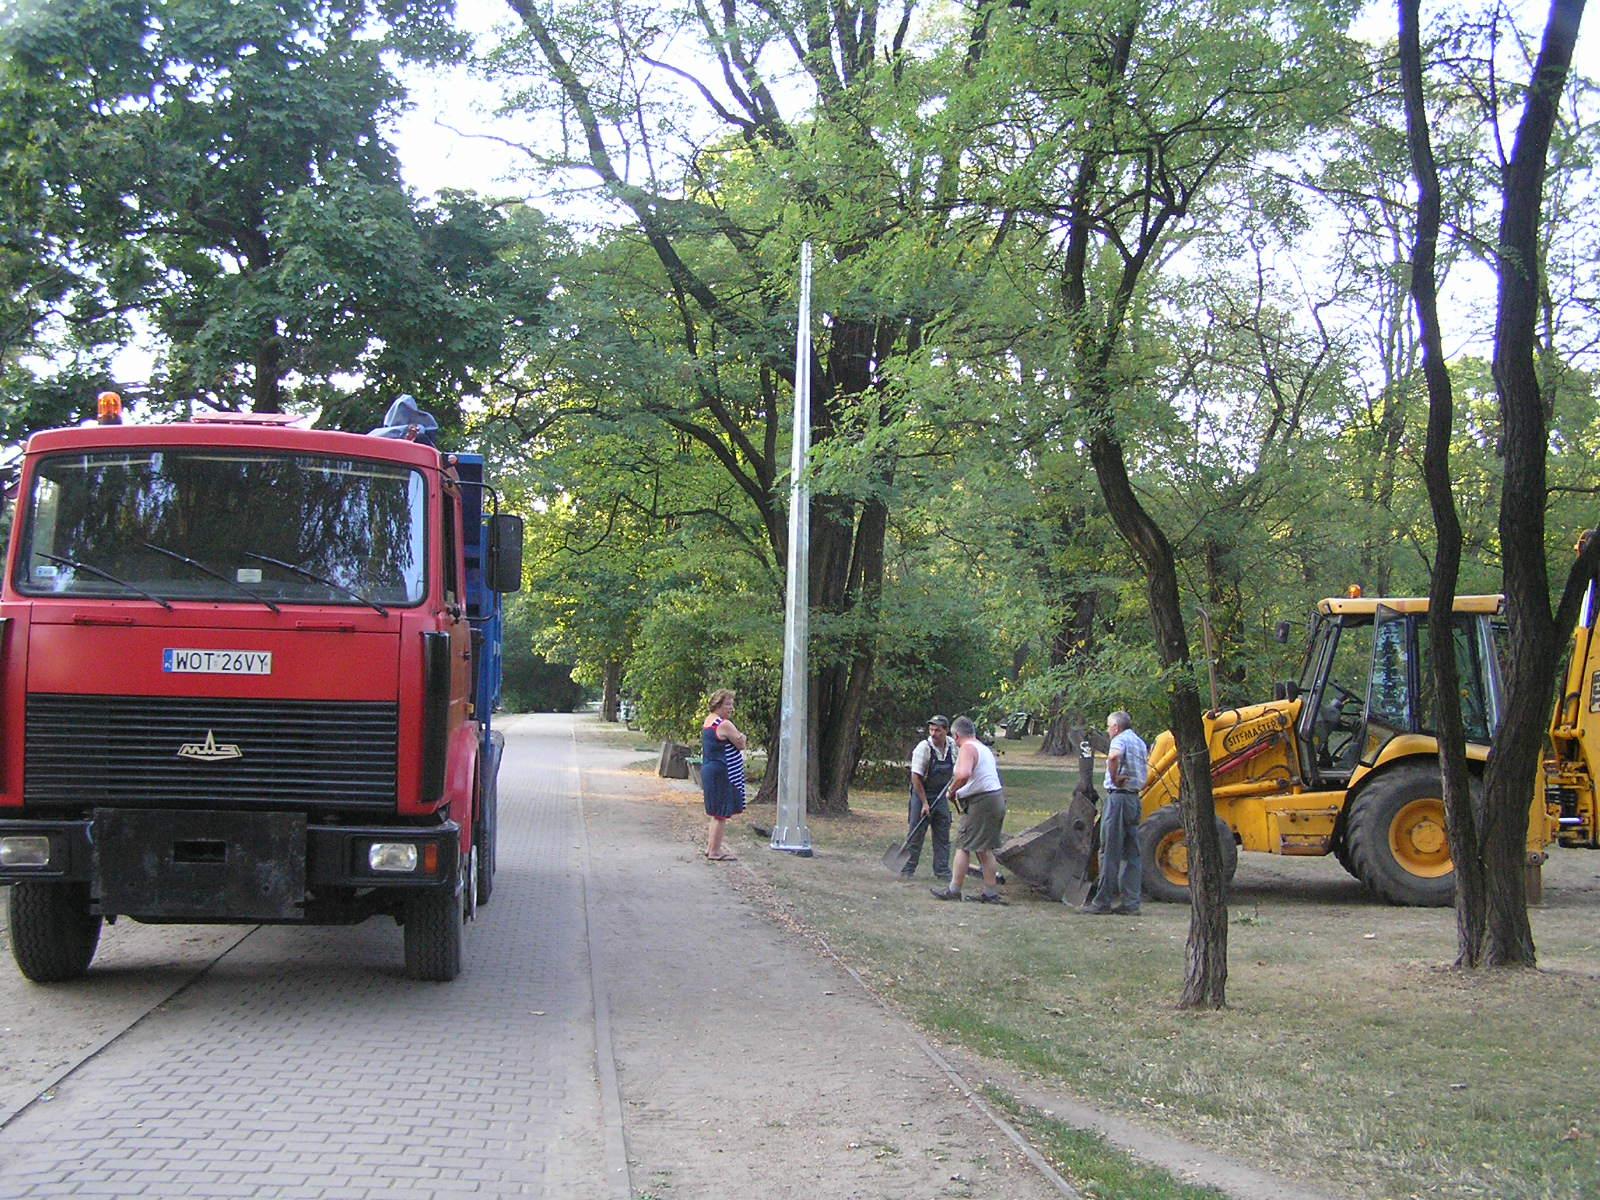 Montaż latarni w parku